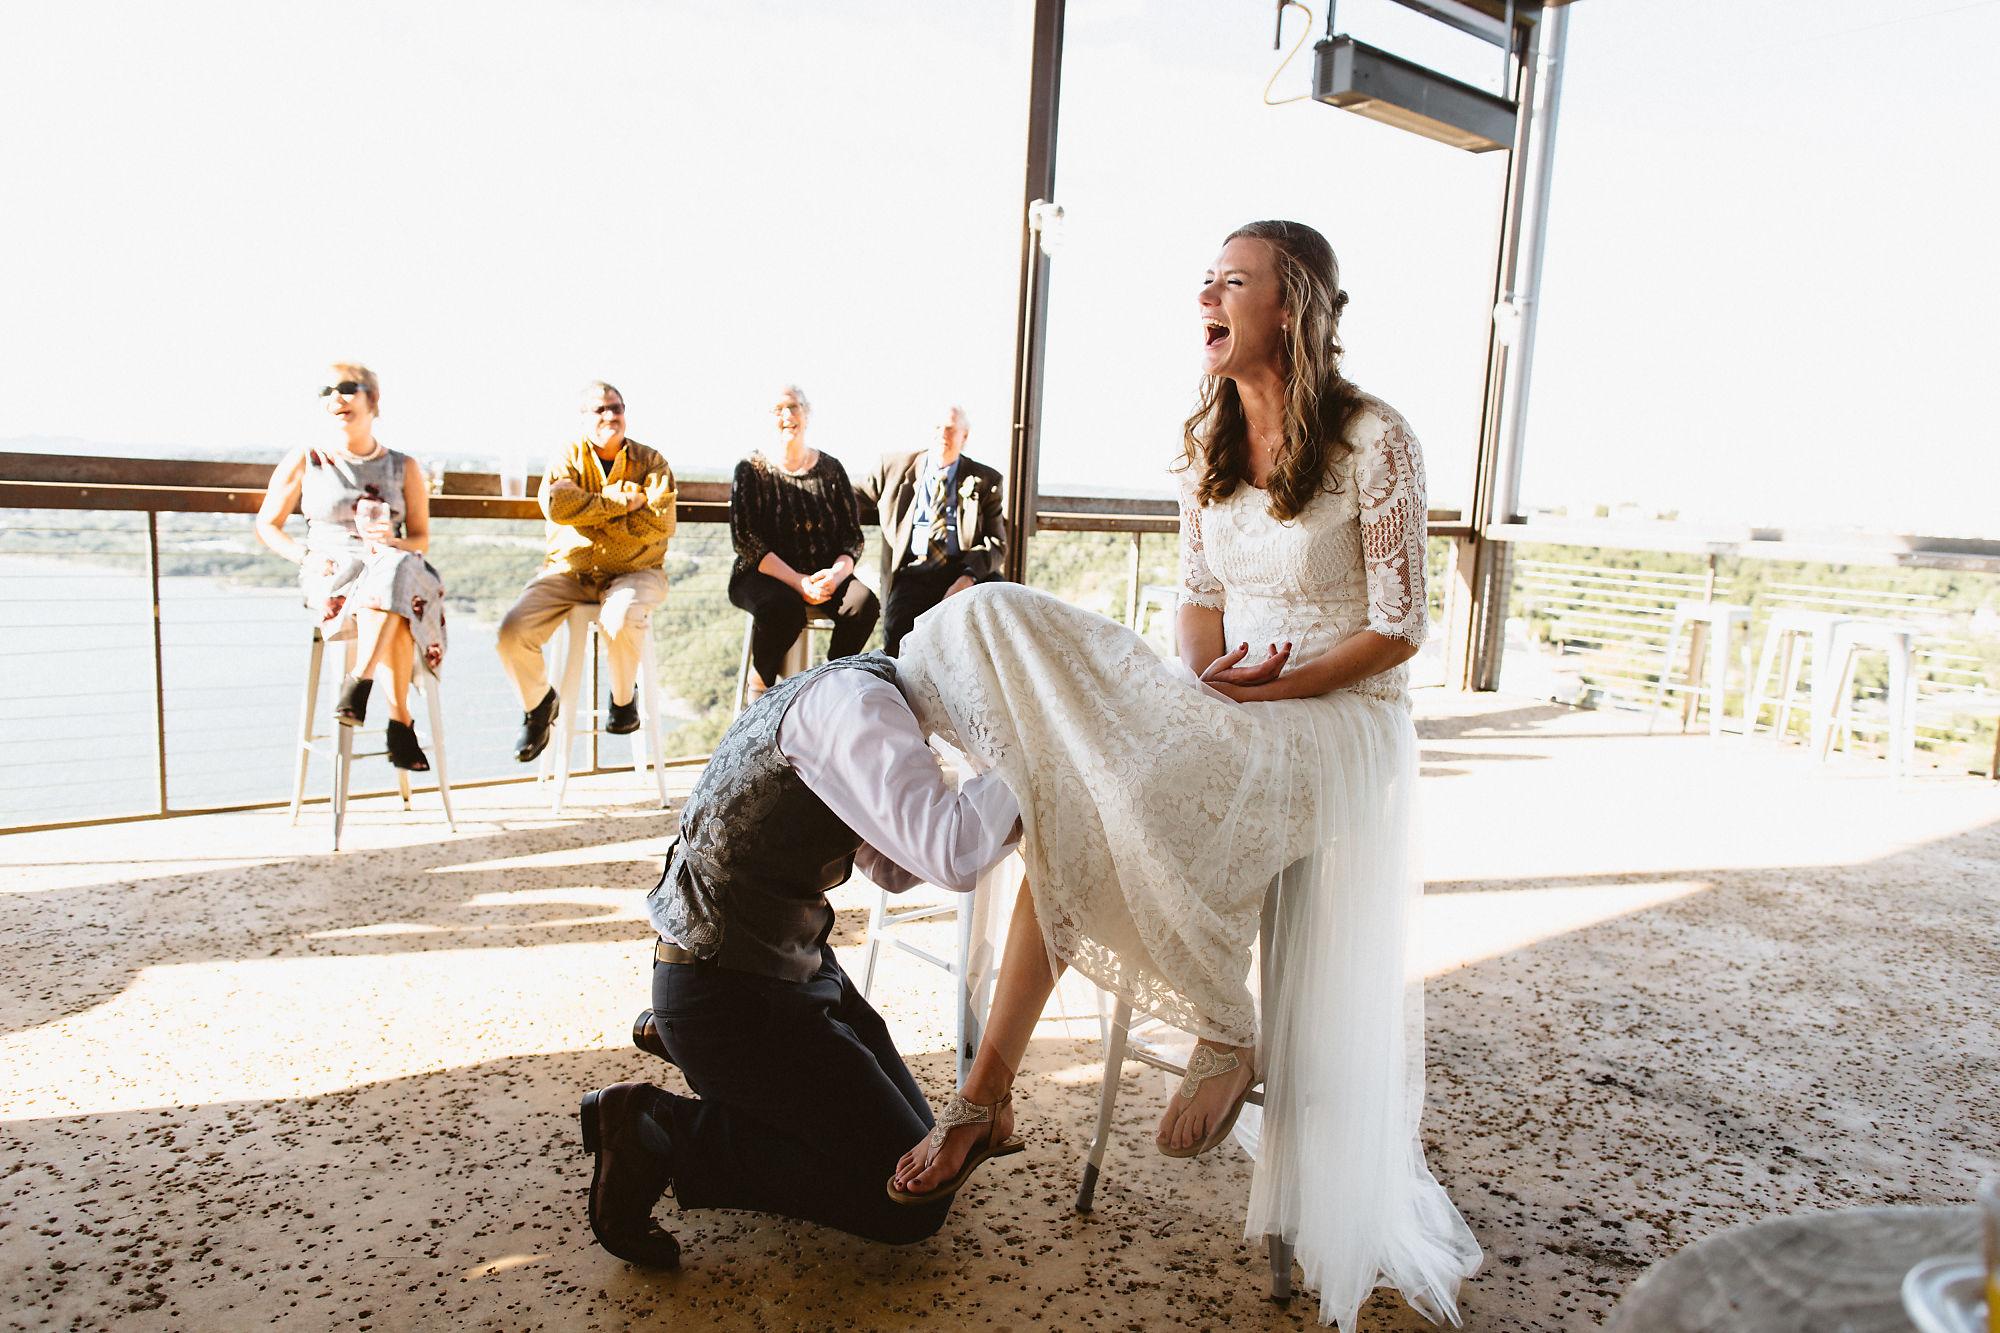 jessica_austin_oasis_brewery_wedding_photos162145.jpg